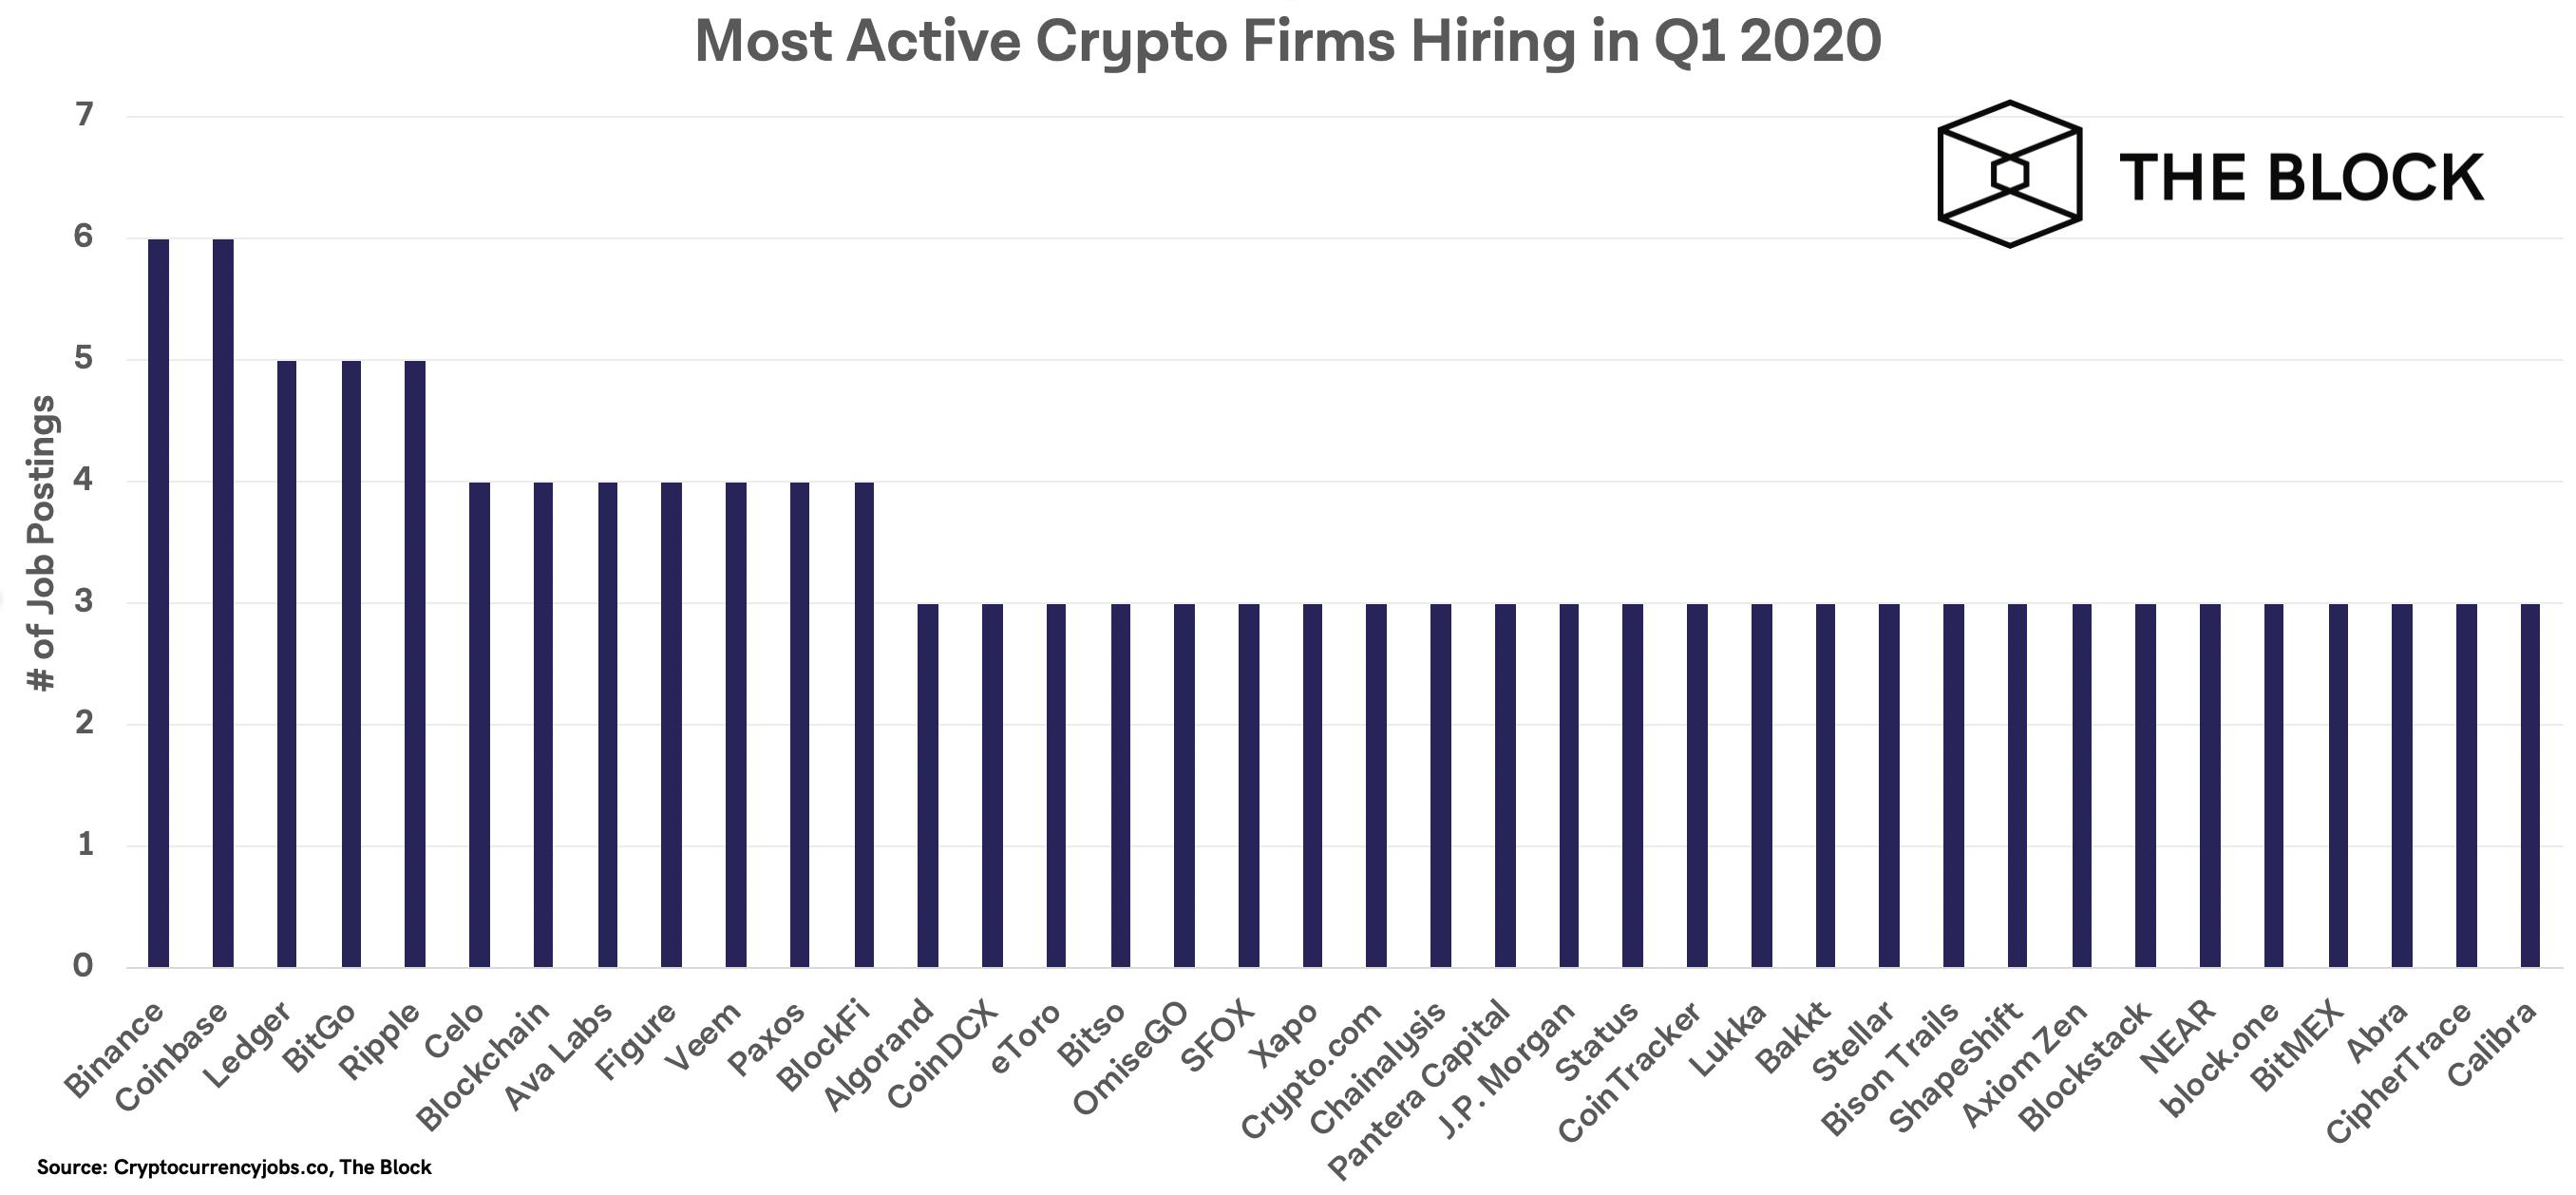 Binance, Coinbase ว่าจ้างงานมากที่สุดในวงการคริปโต ในไตรมาสแรกของปี 2020